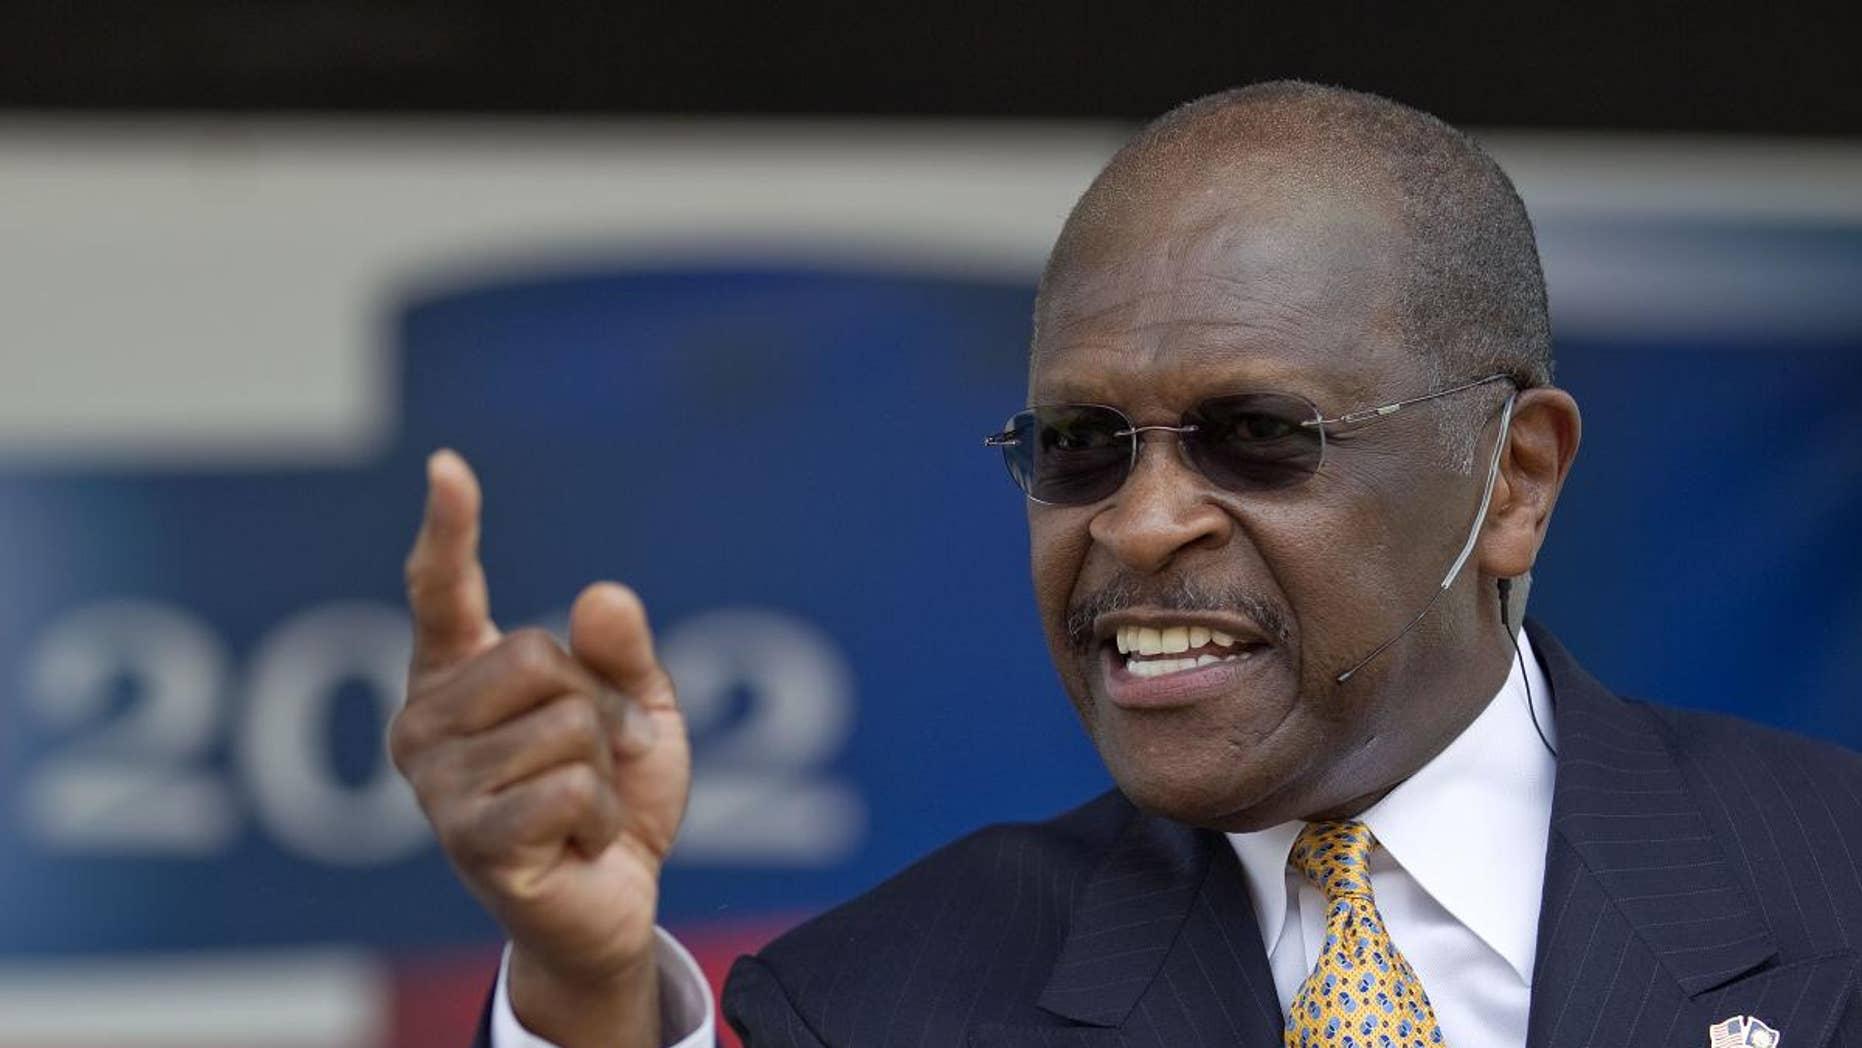 Herman Cain announces his run for Republican candidate for president at a rally Saturday, May 21 in Atlanta. (AP Photo/David Goldman)